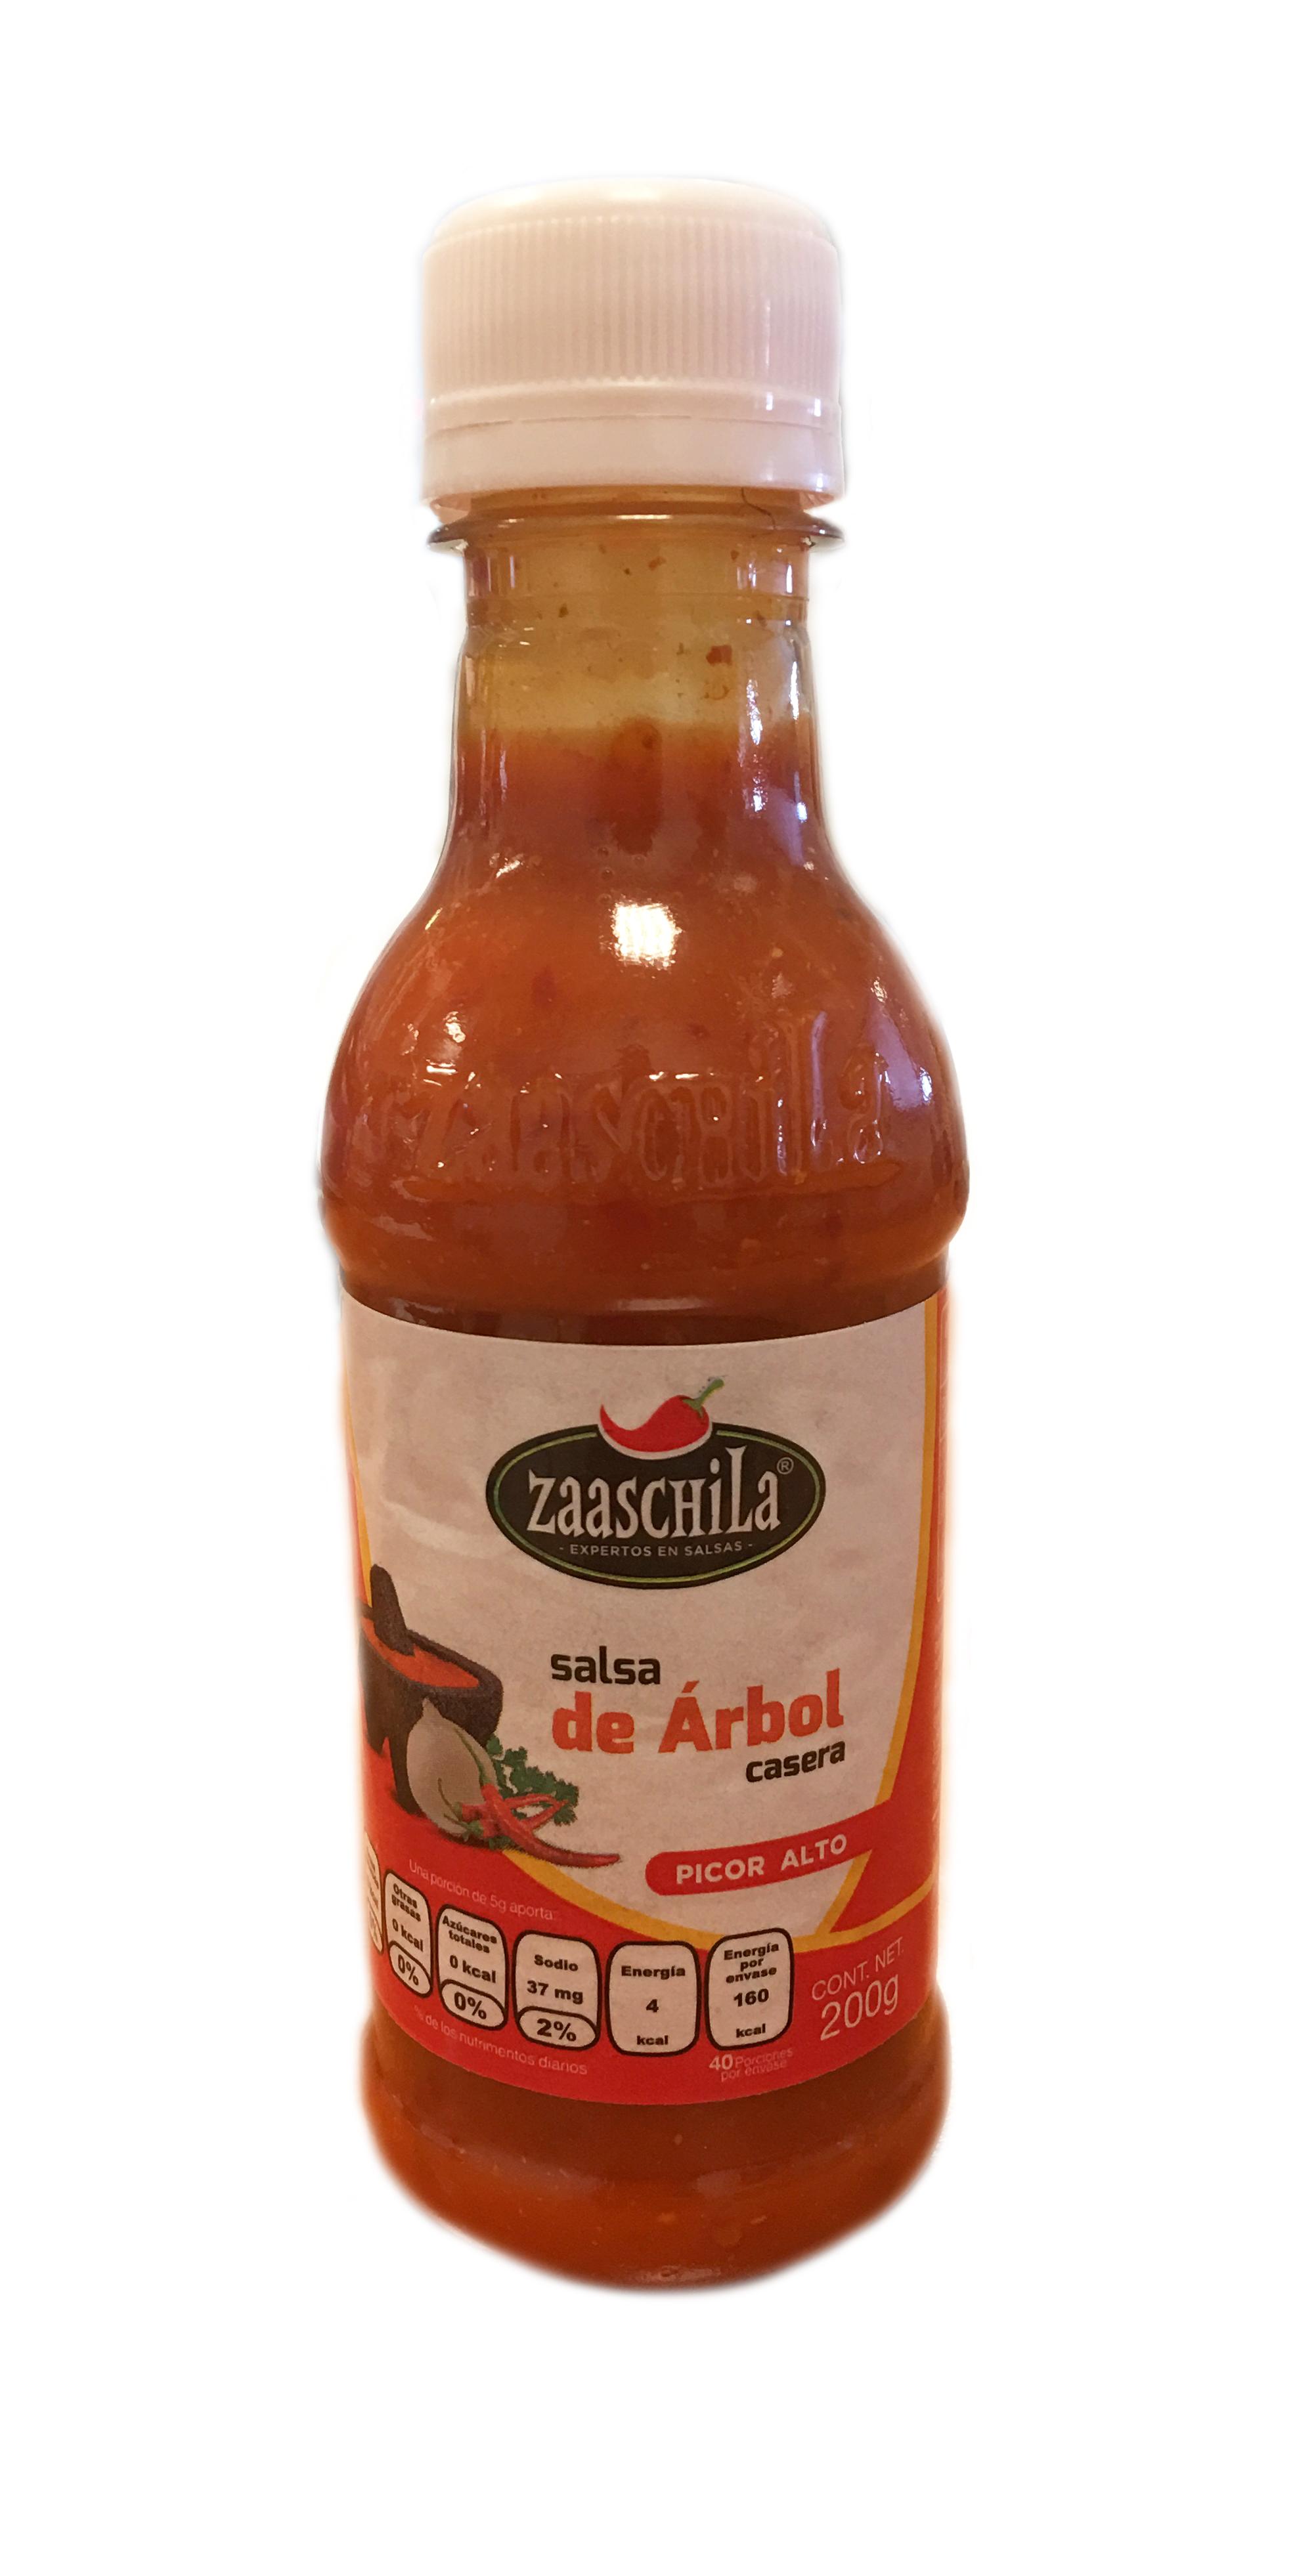 Salsa cremosa de Árbol Zaaschila 200g botella de plastico